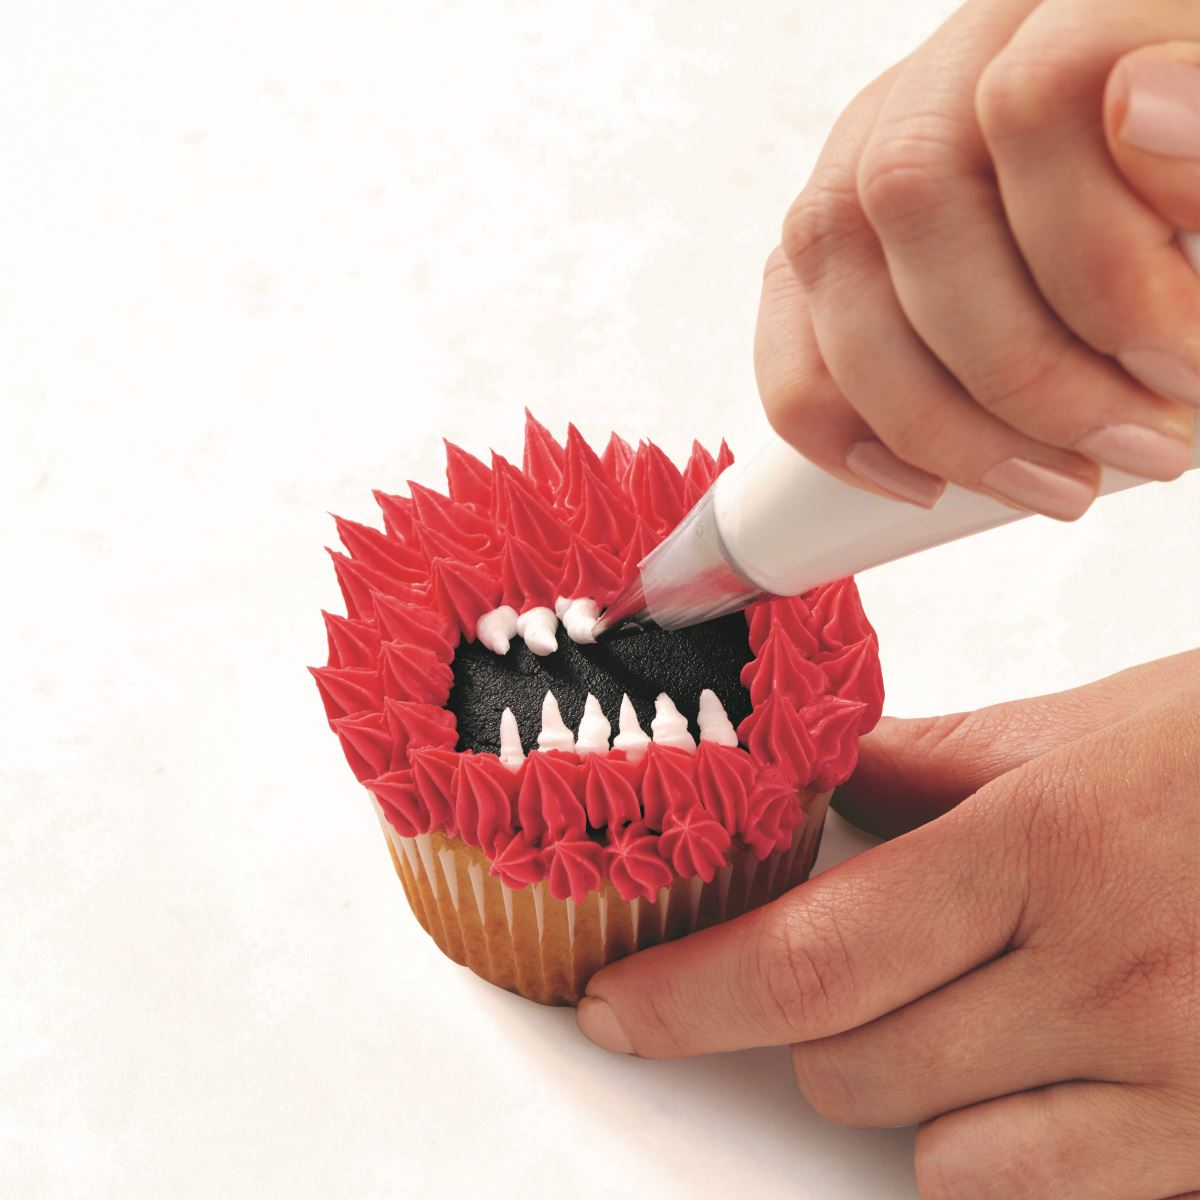 PINK ONE-EYED MONSTER CUPCAKE step 4